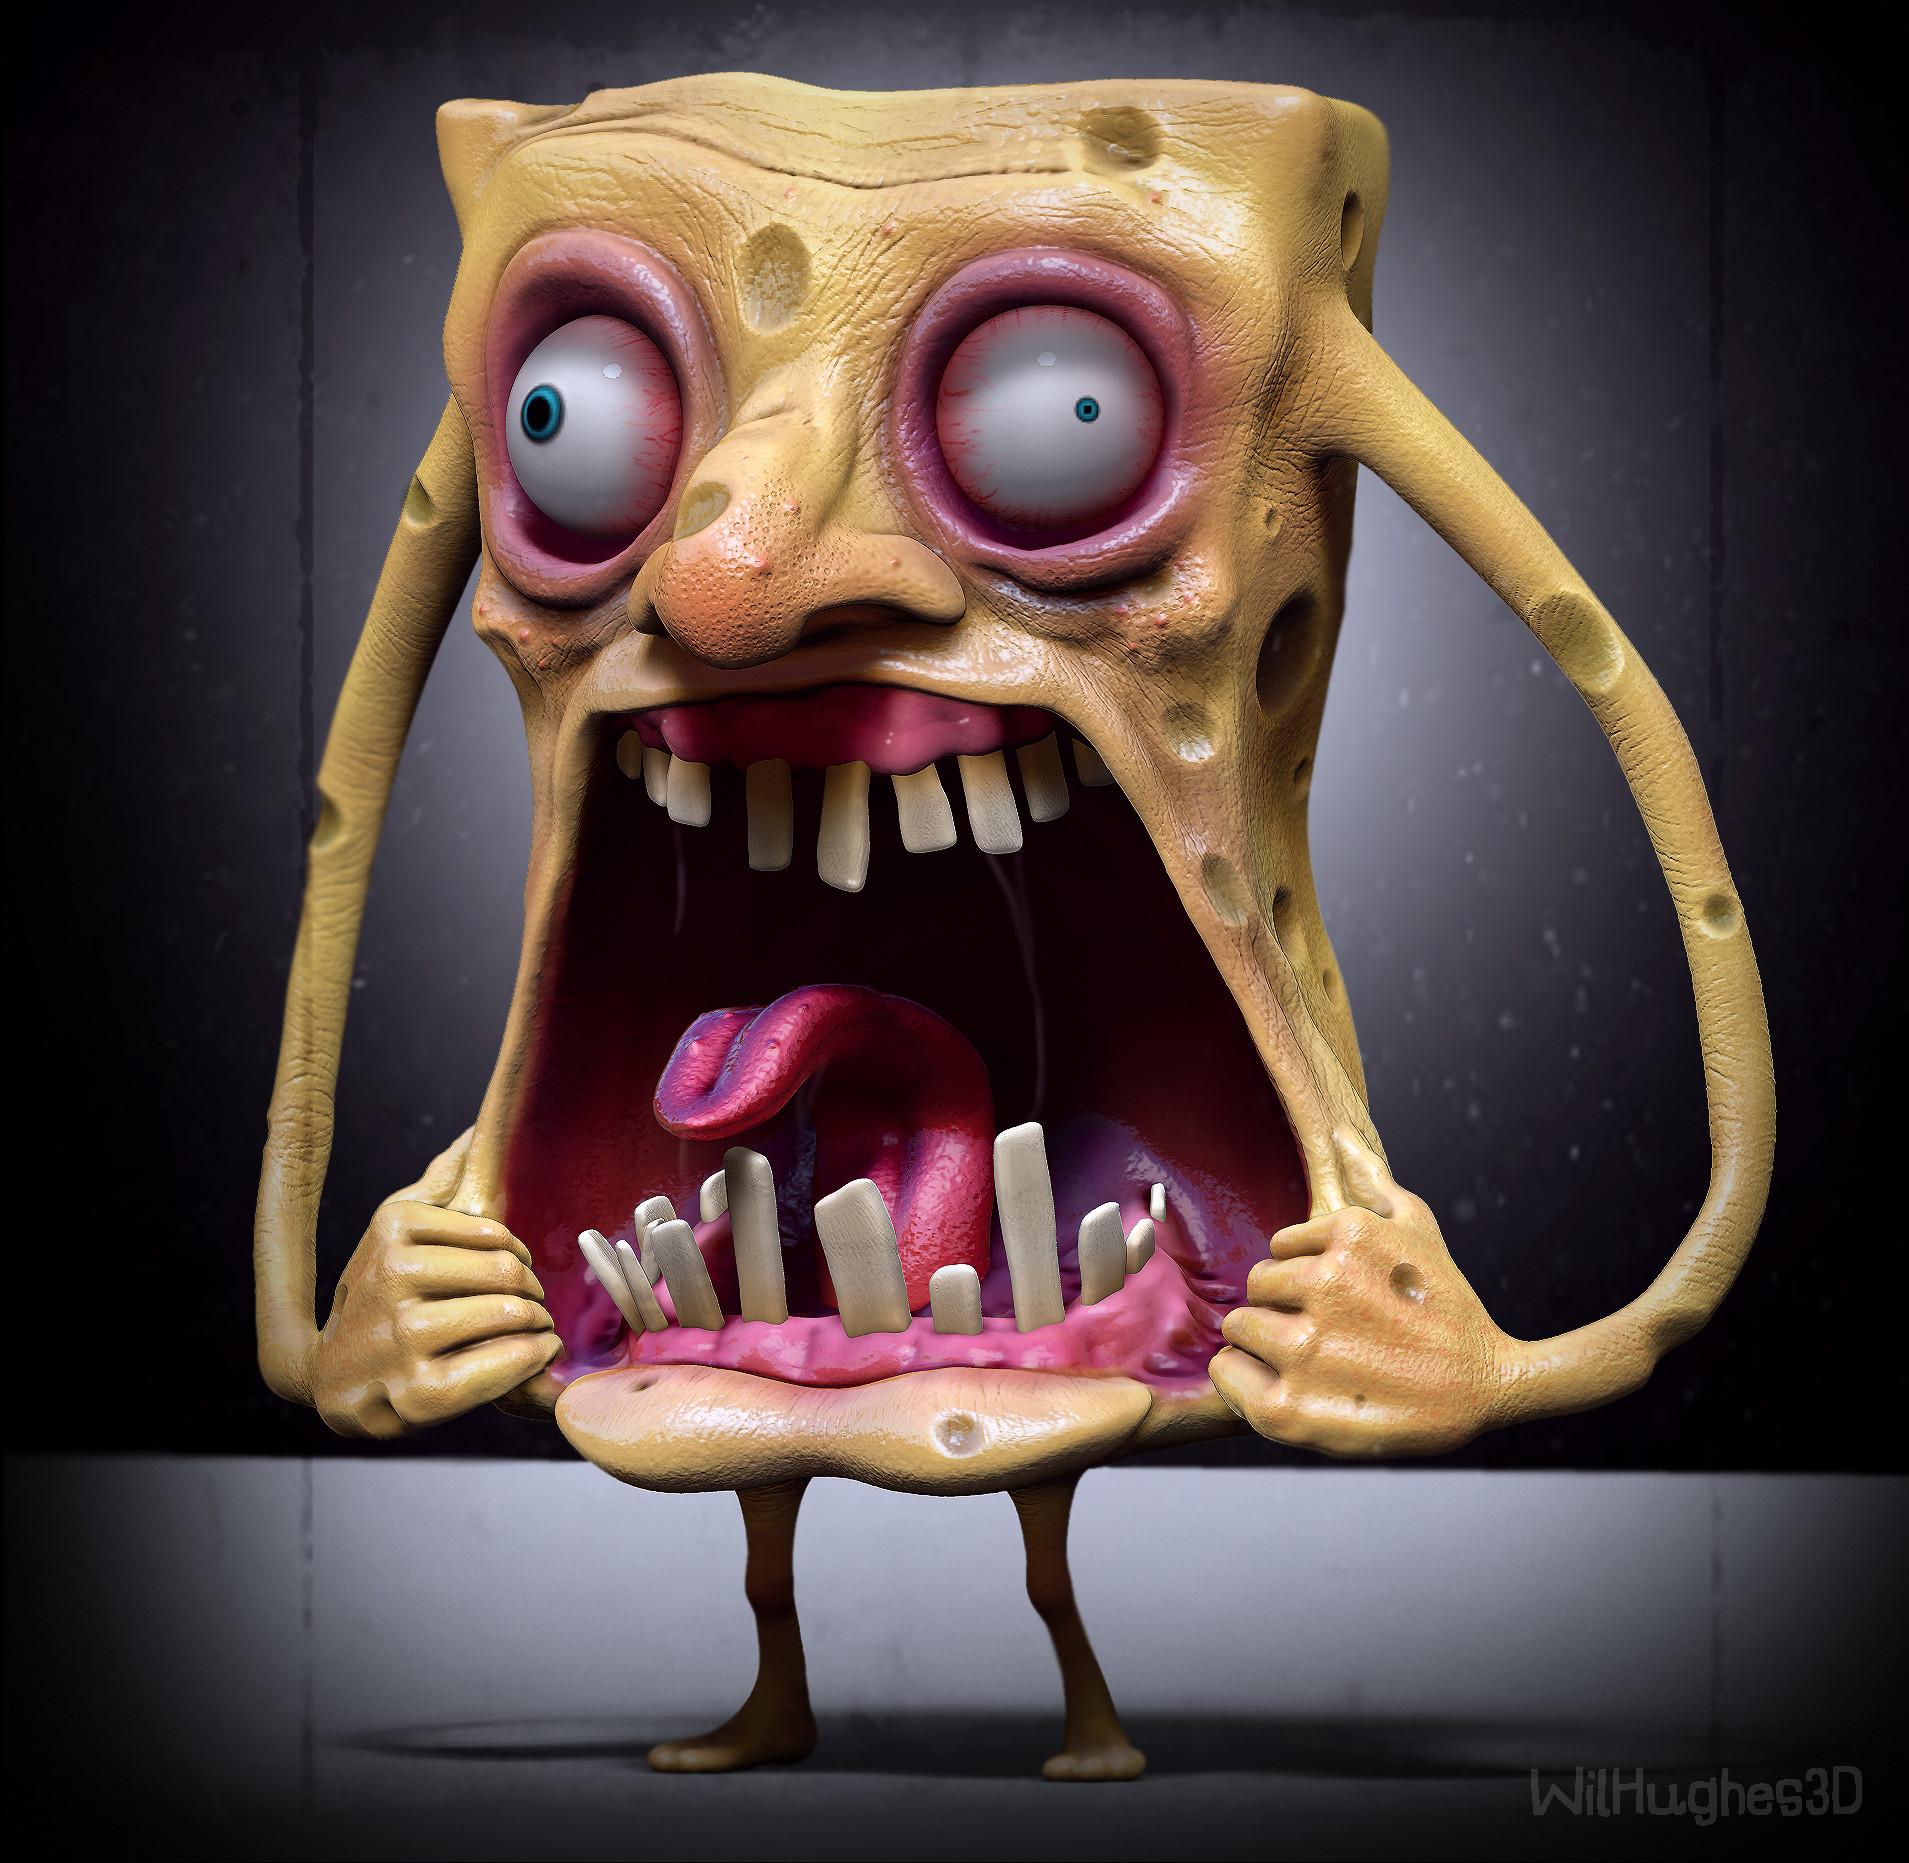 Wil hughes spongebob